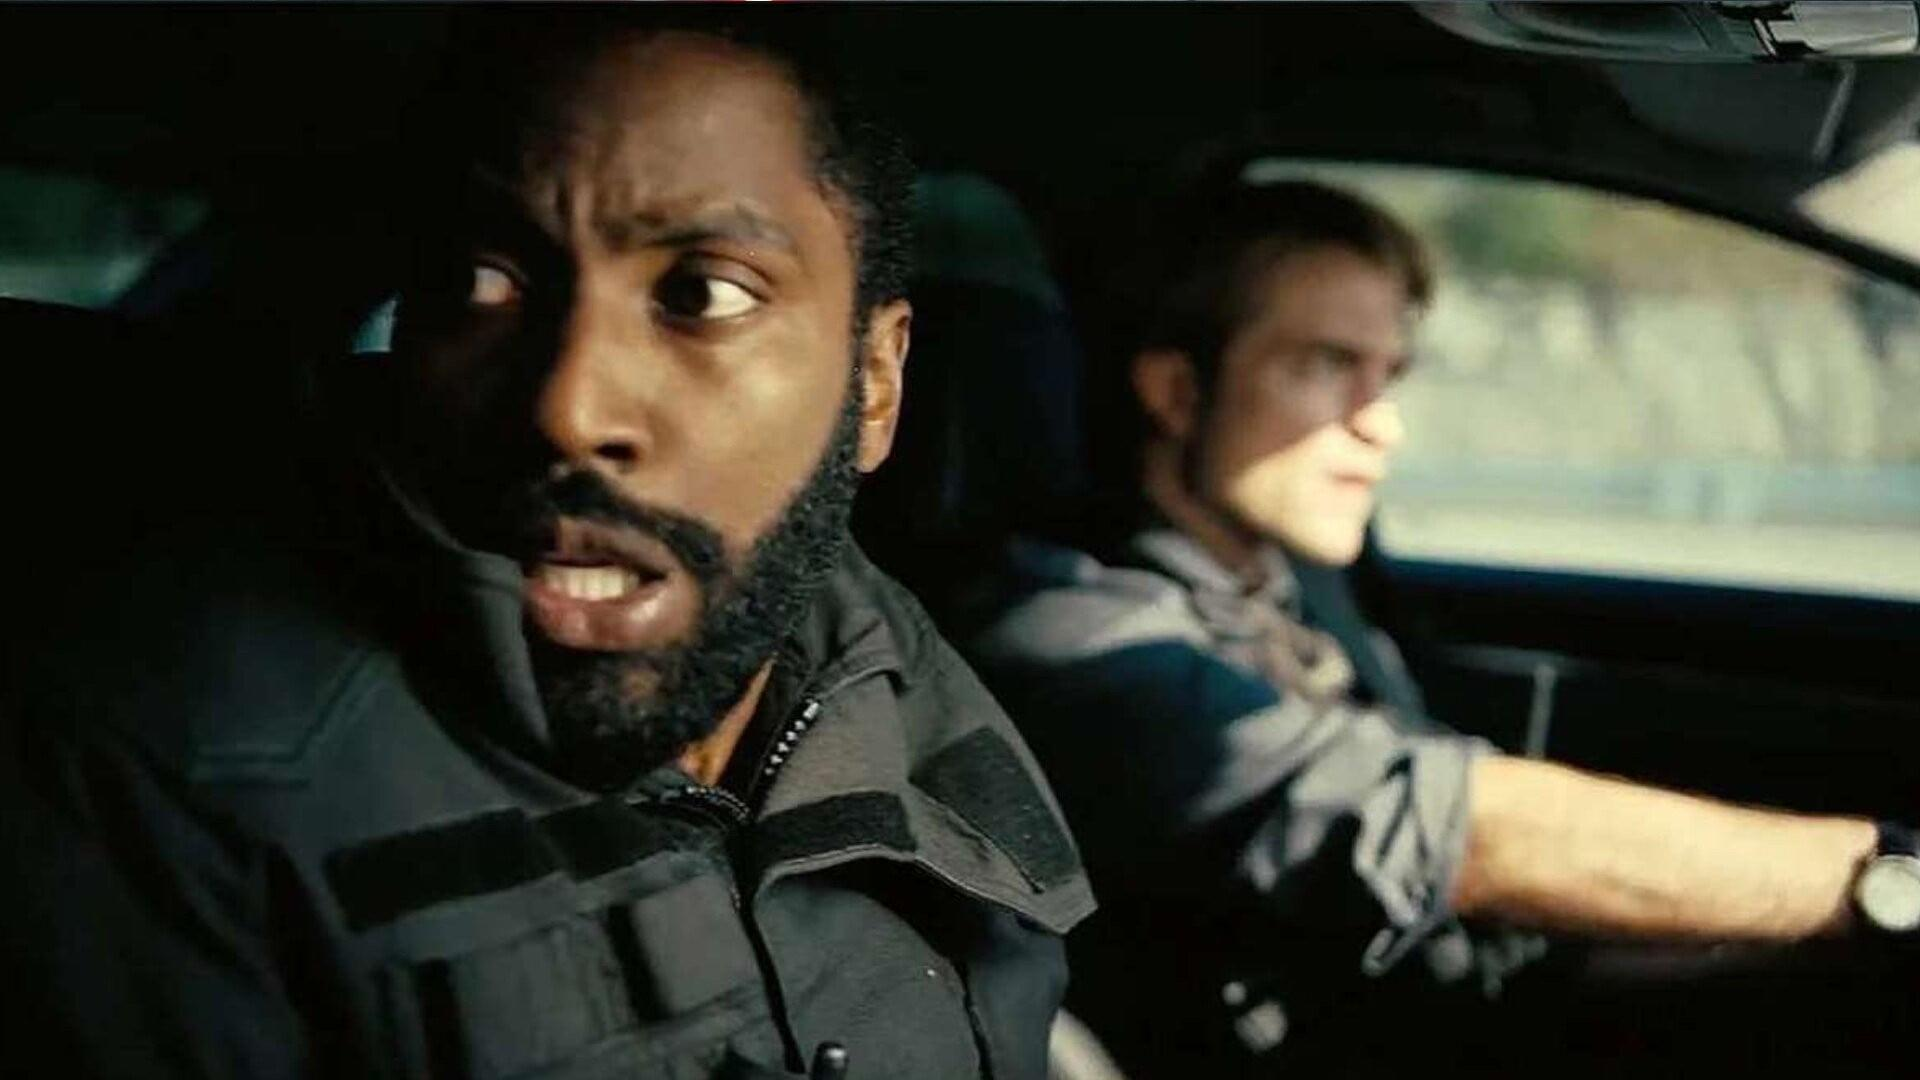 The new Tenet trailer is debuting in Fortnite. Yes, Fortnite